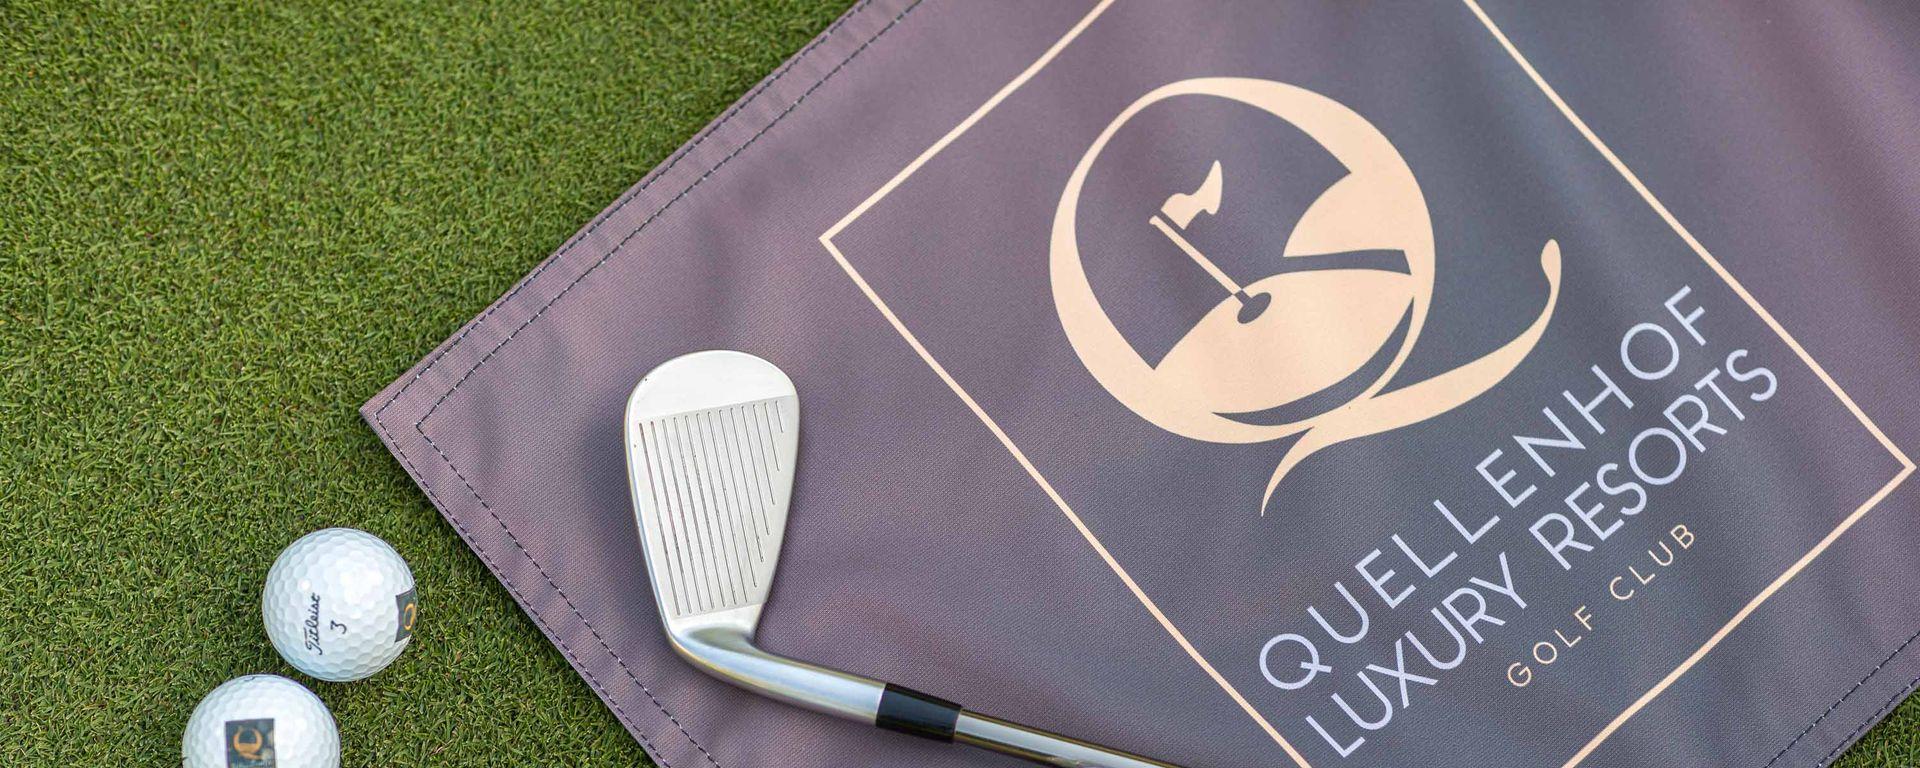 Quellenhof Golf-Abgabe-WEB-092-116.jpg